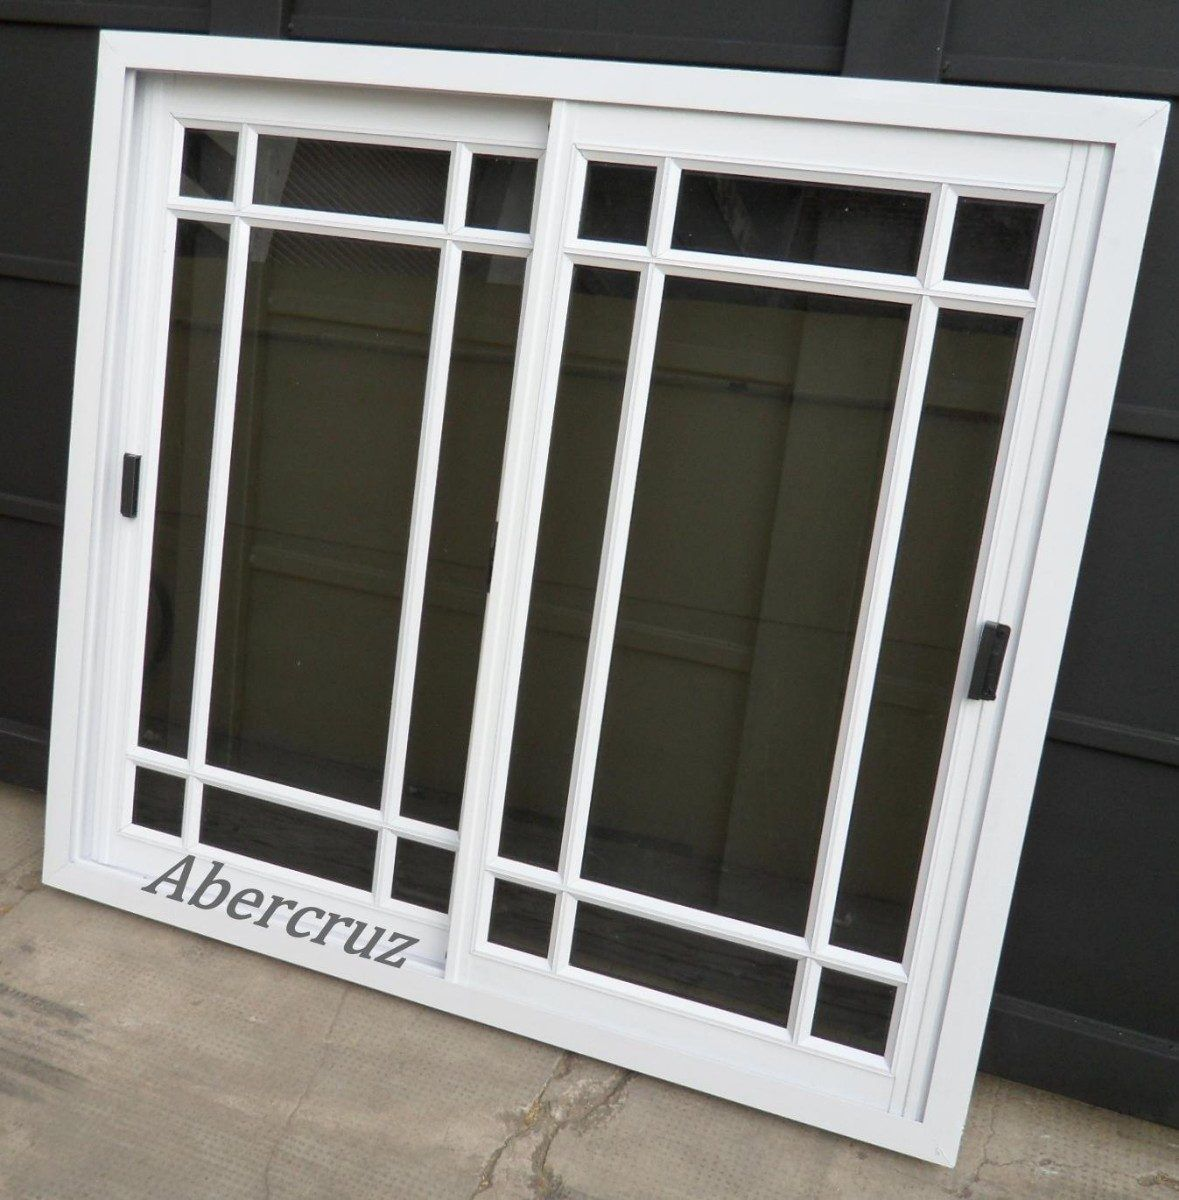 Imagen de http mla s1 - Puertas de casas modernas ...